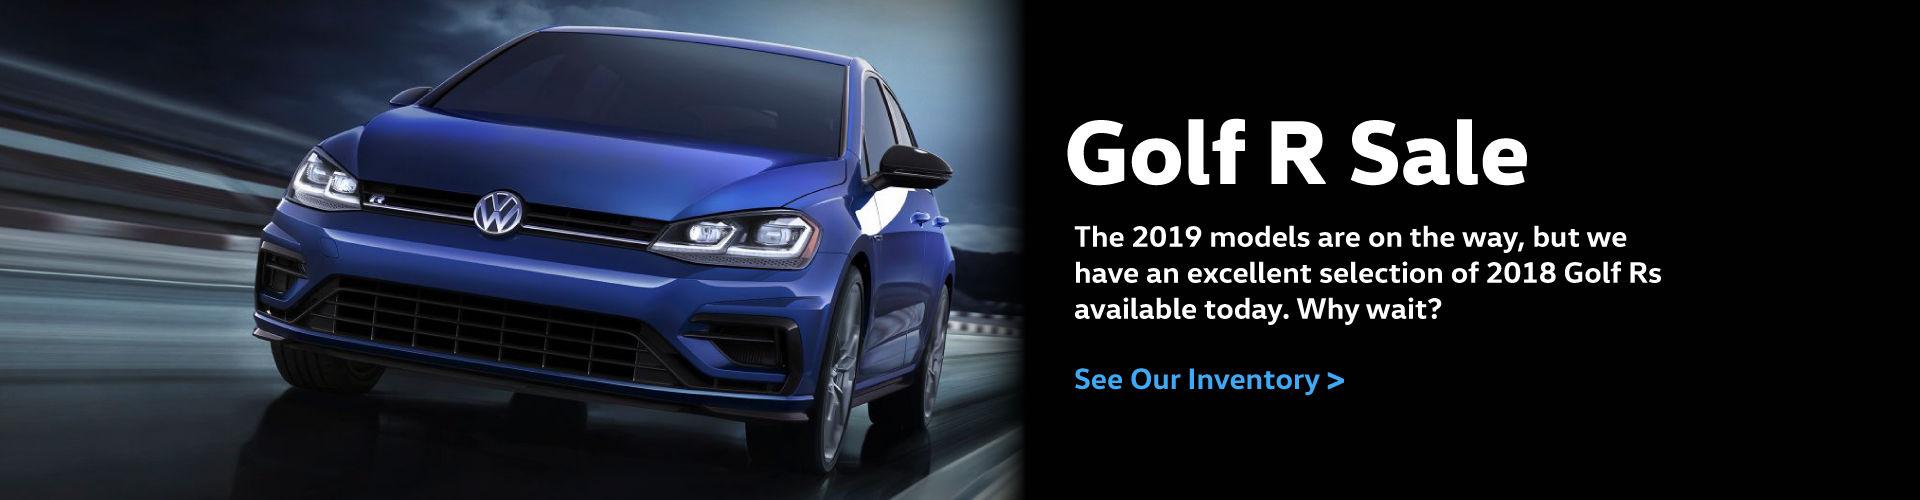 2018 Golf R Sale